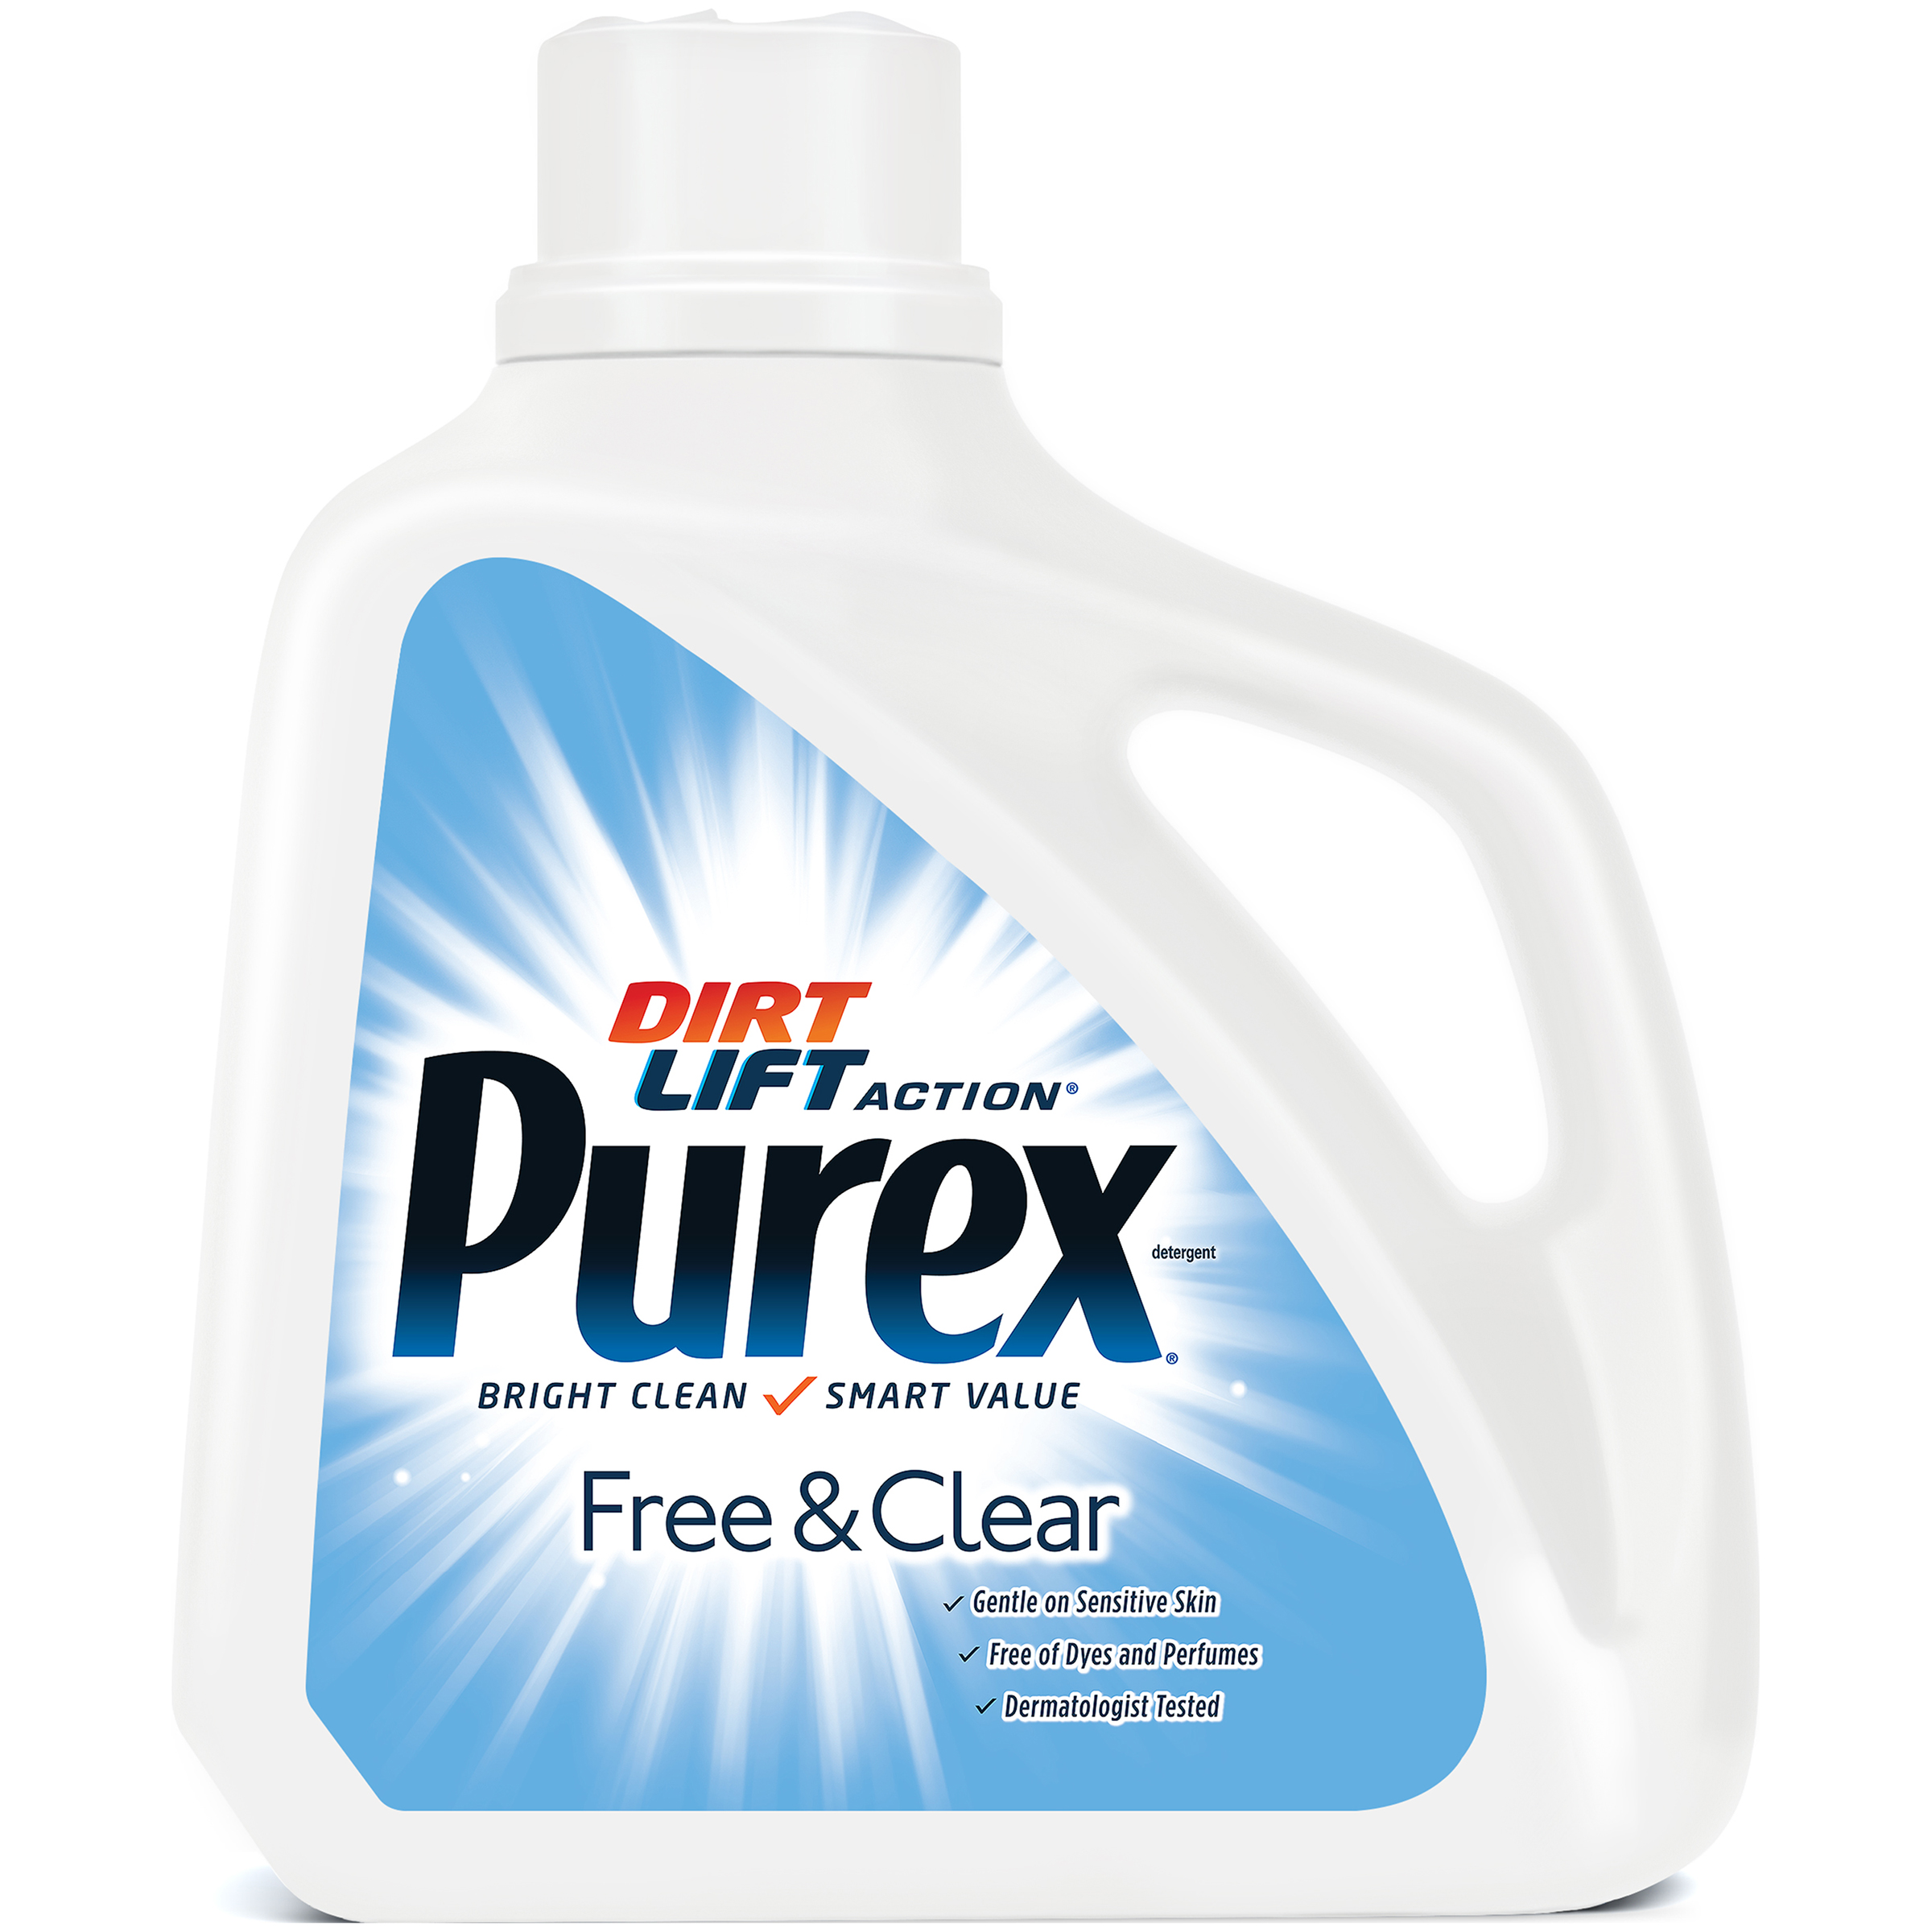 Purex Liquid Laundry Detergent, Free & Clear, 150 Fluid Ounces, 100 Loads